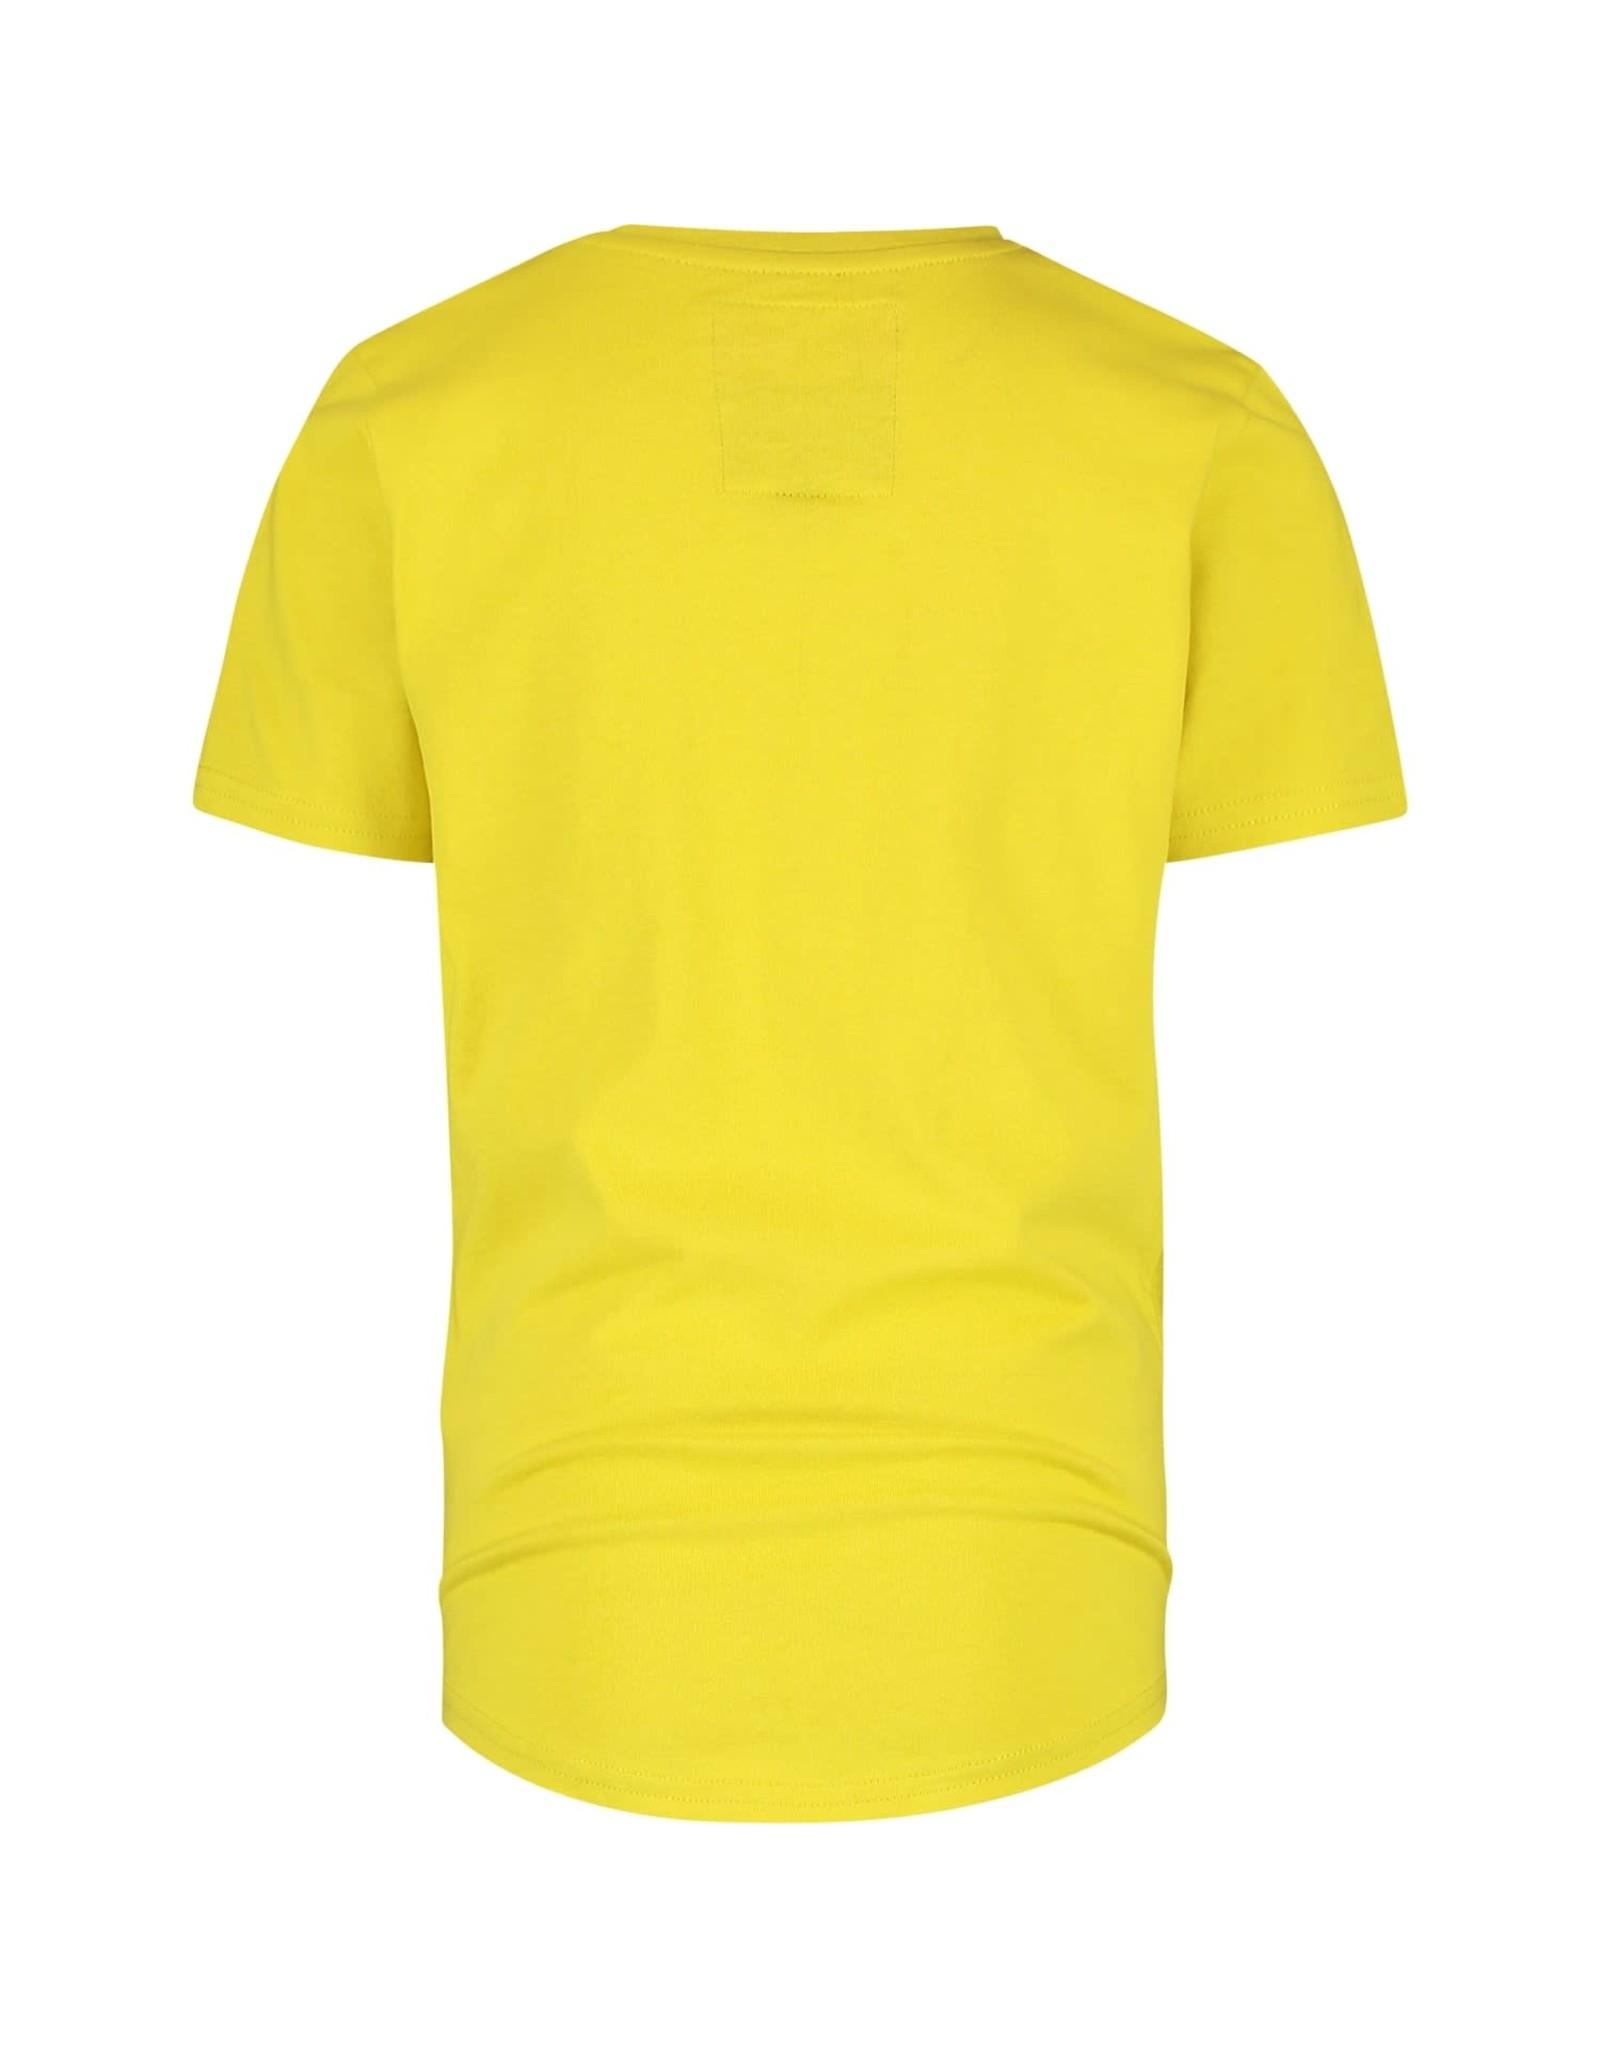 Vingino Vingino jongens t-shirt Hargo Vargan Light